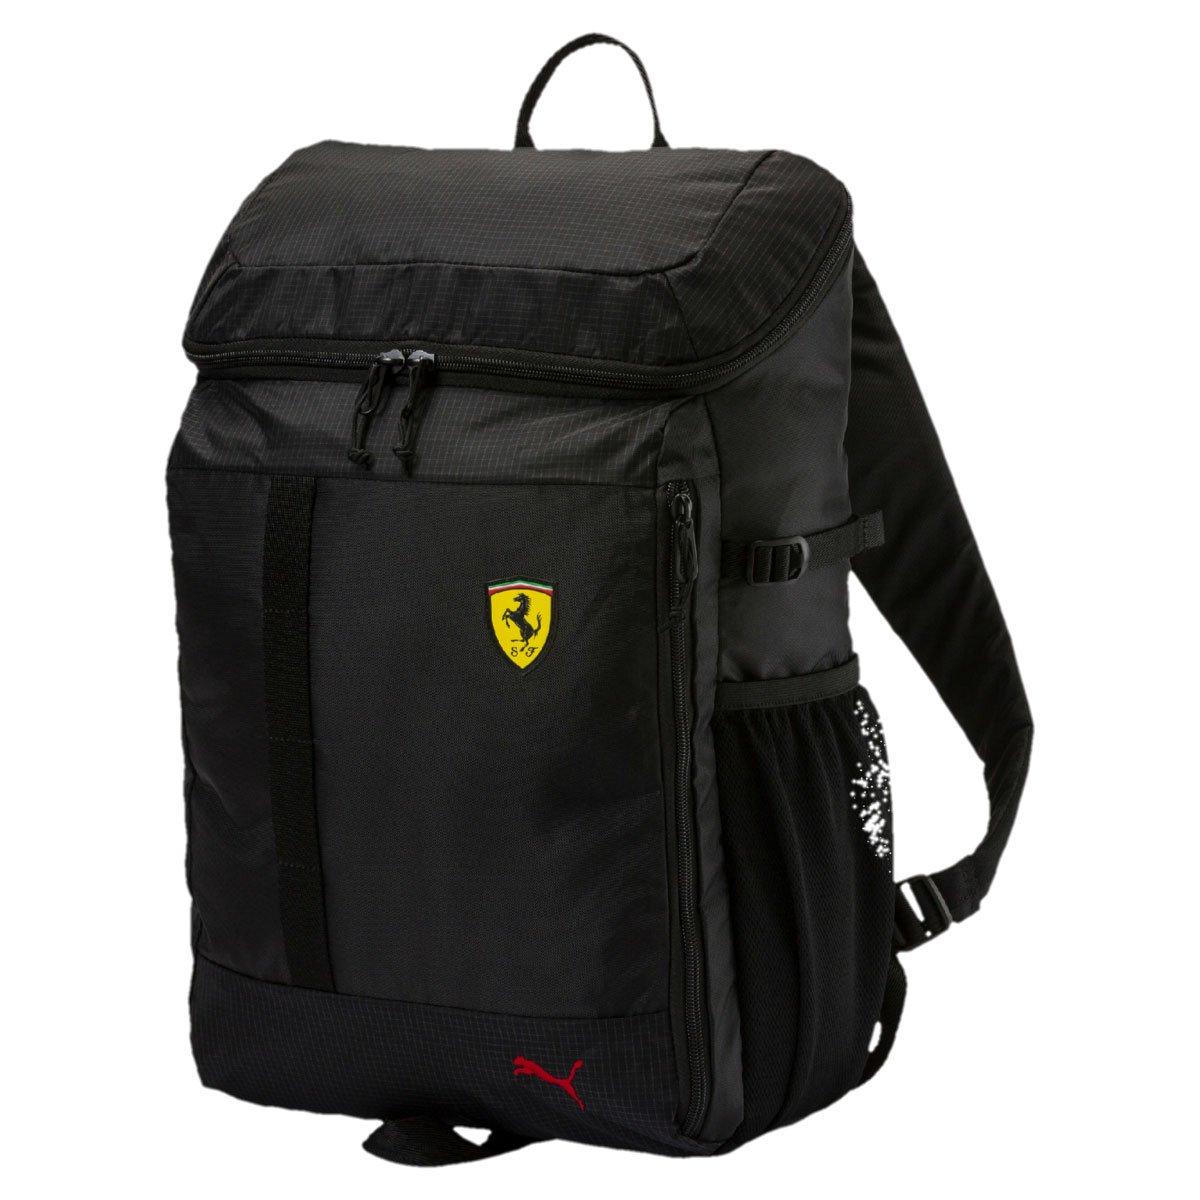 6374e4193 Mochila unisex fanwear Ferrari Puma | SEARS.COM.MX - Me entiende!